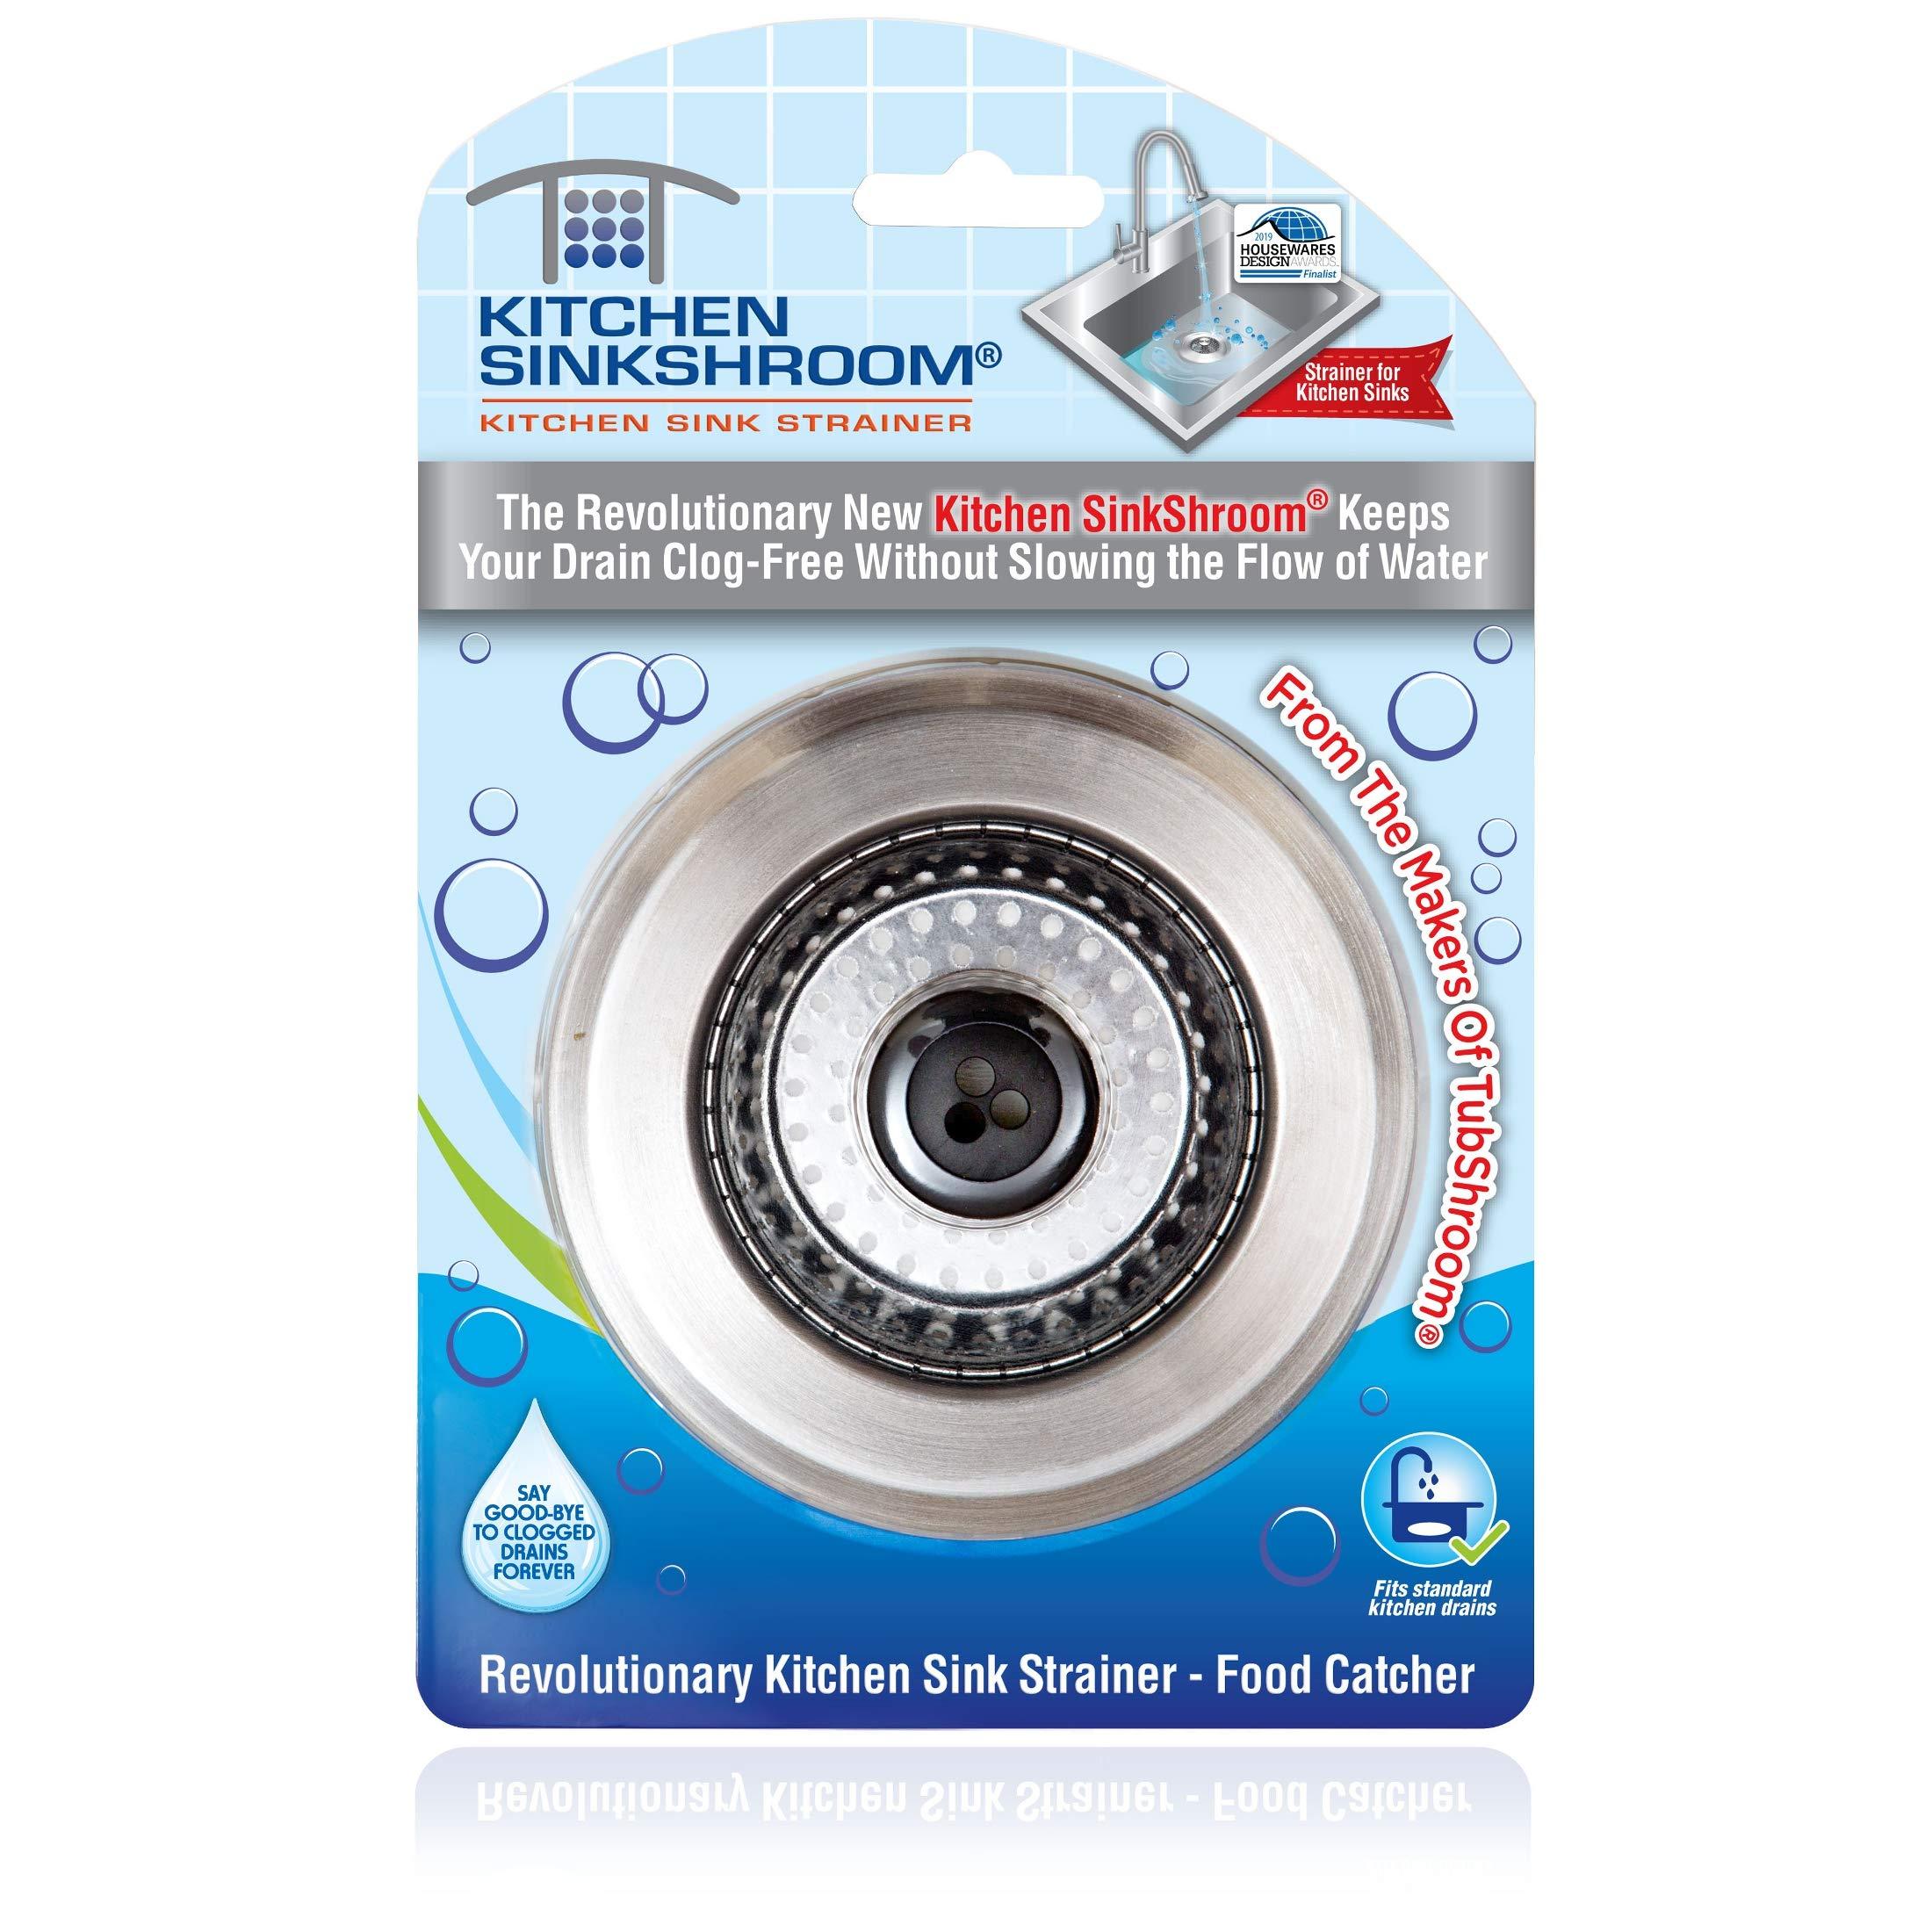 Kitchen SinkShroom Revolutionary Clog-Free Stainless Steel Sink Strainer, Black by SinkShroom